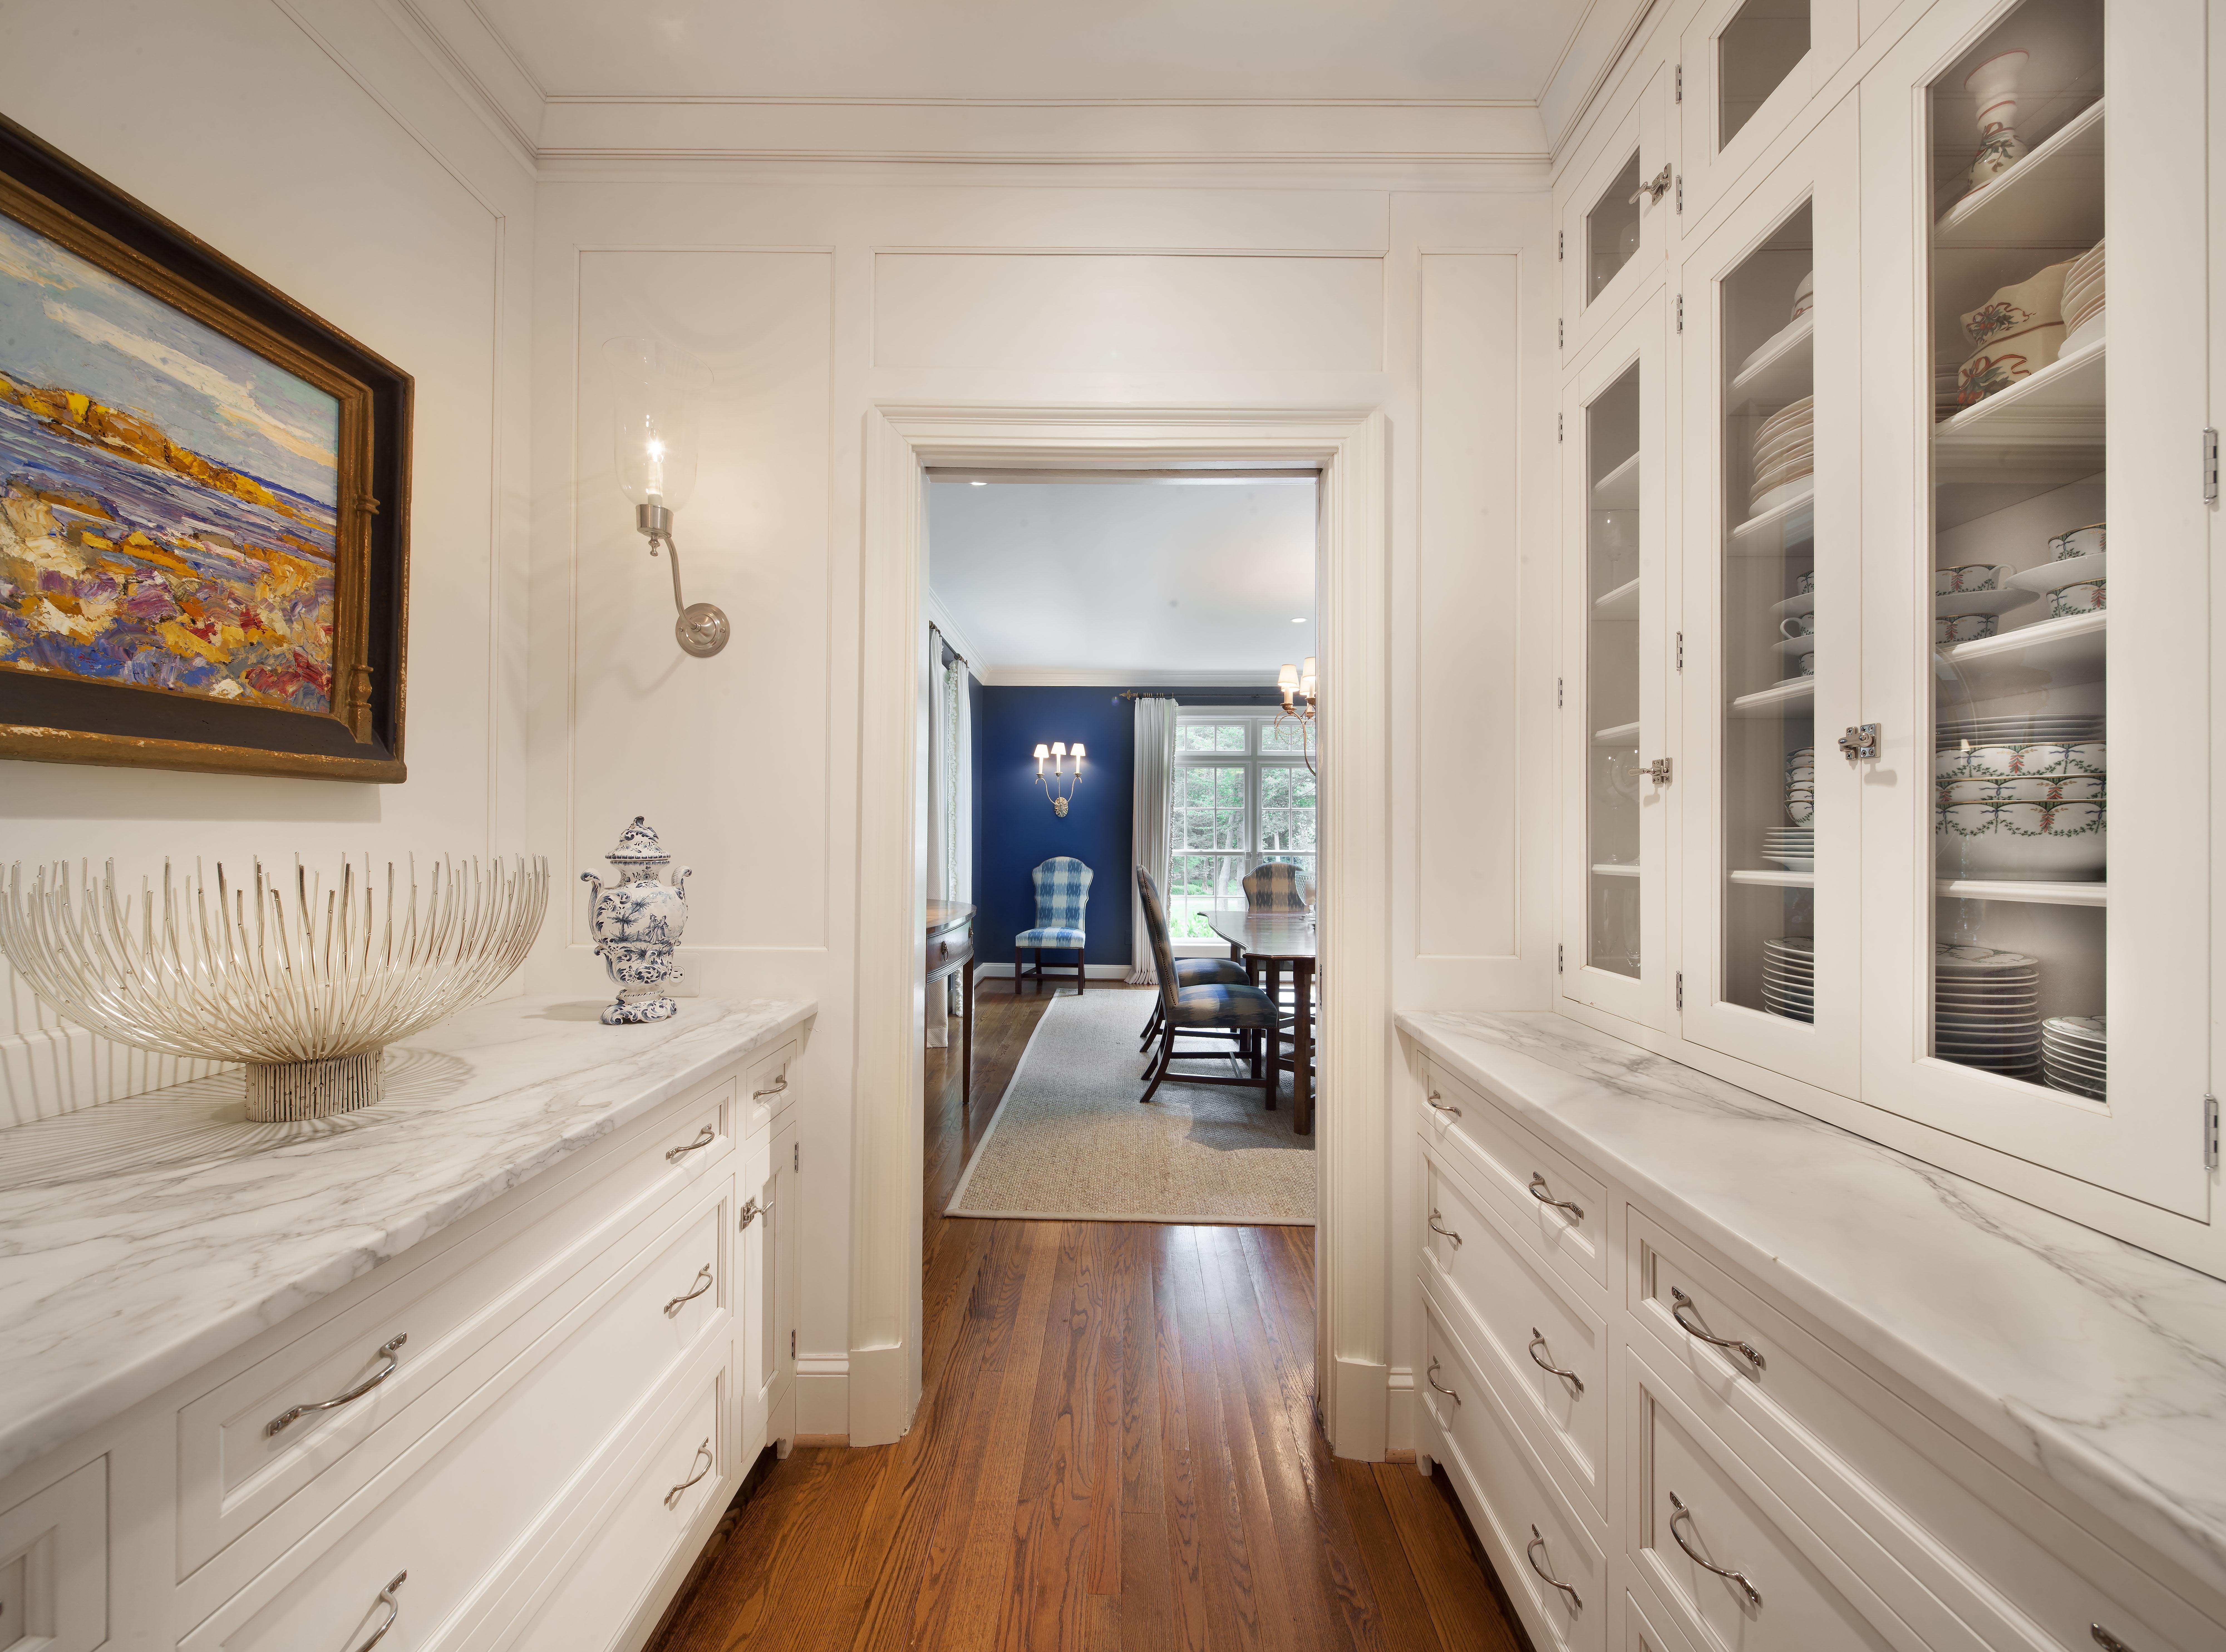 McLean VA Kitchen and Interior Remodeling | Gilday Renovations